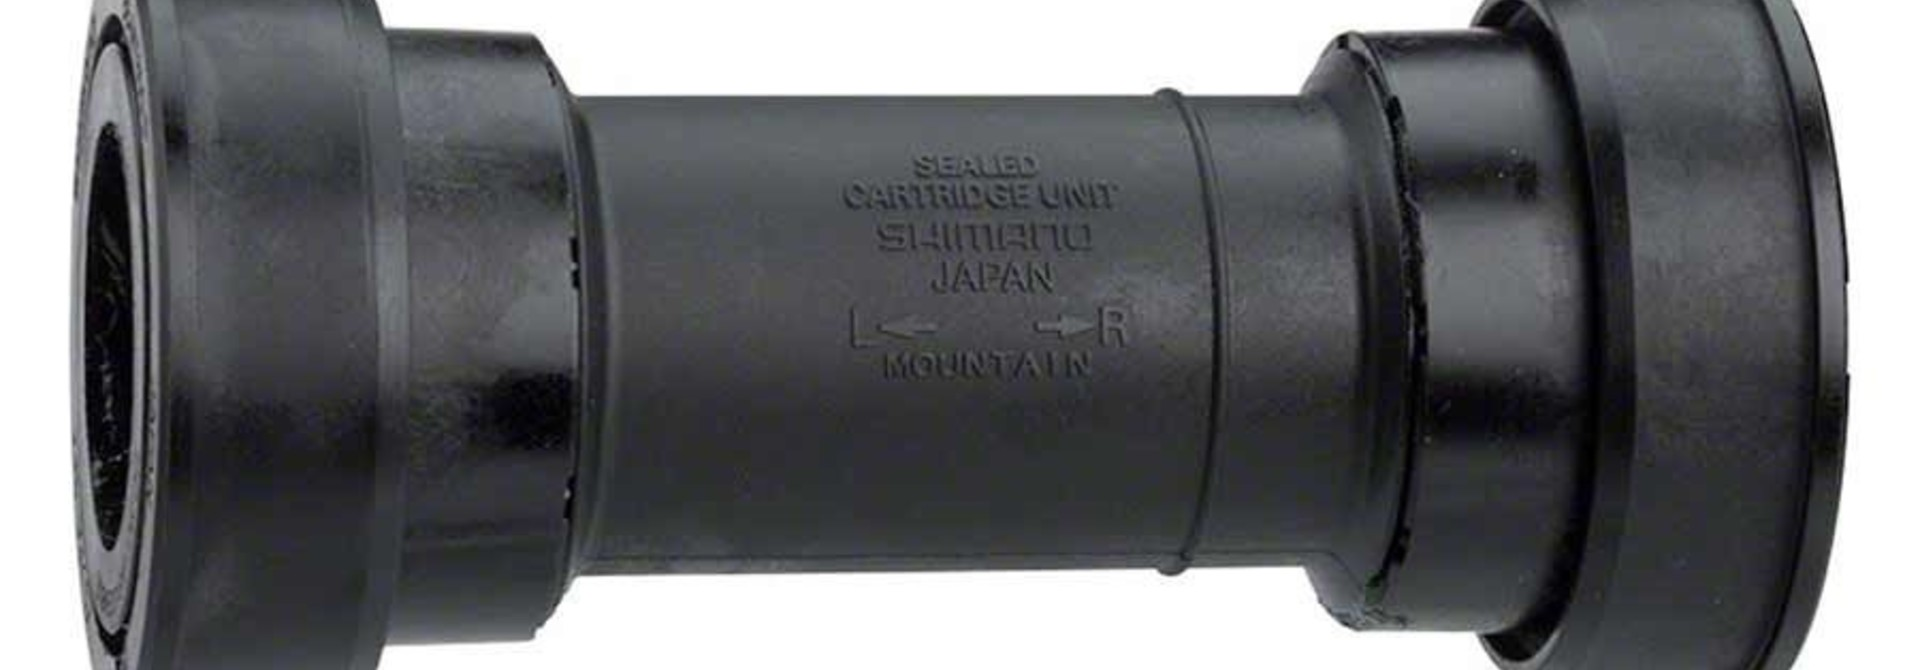 Shimano, XT BB-MT800-PA, Press-fit, BB Shell: 89.5/92mm, Steel, Black, IBBMT800PA